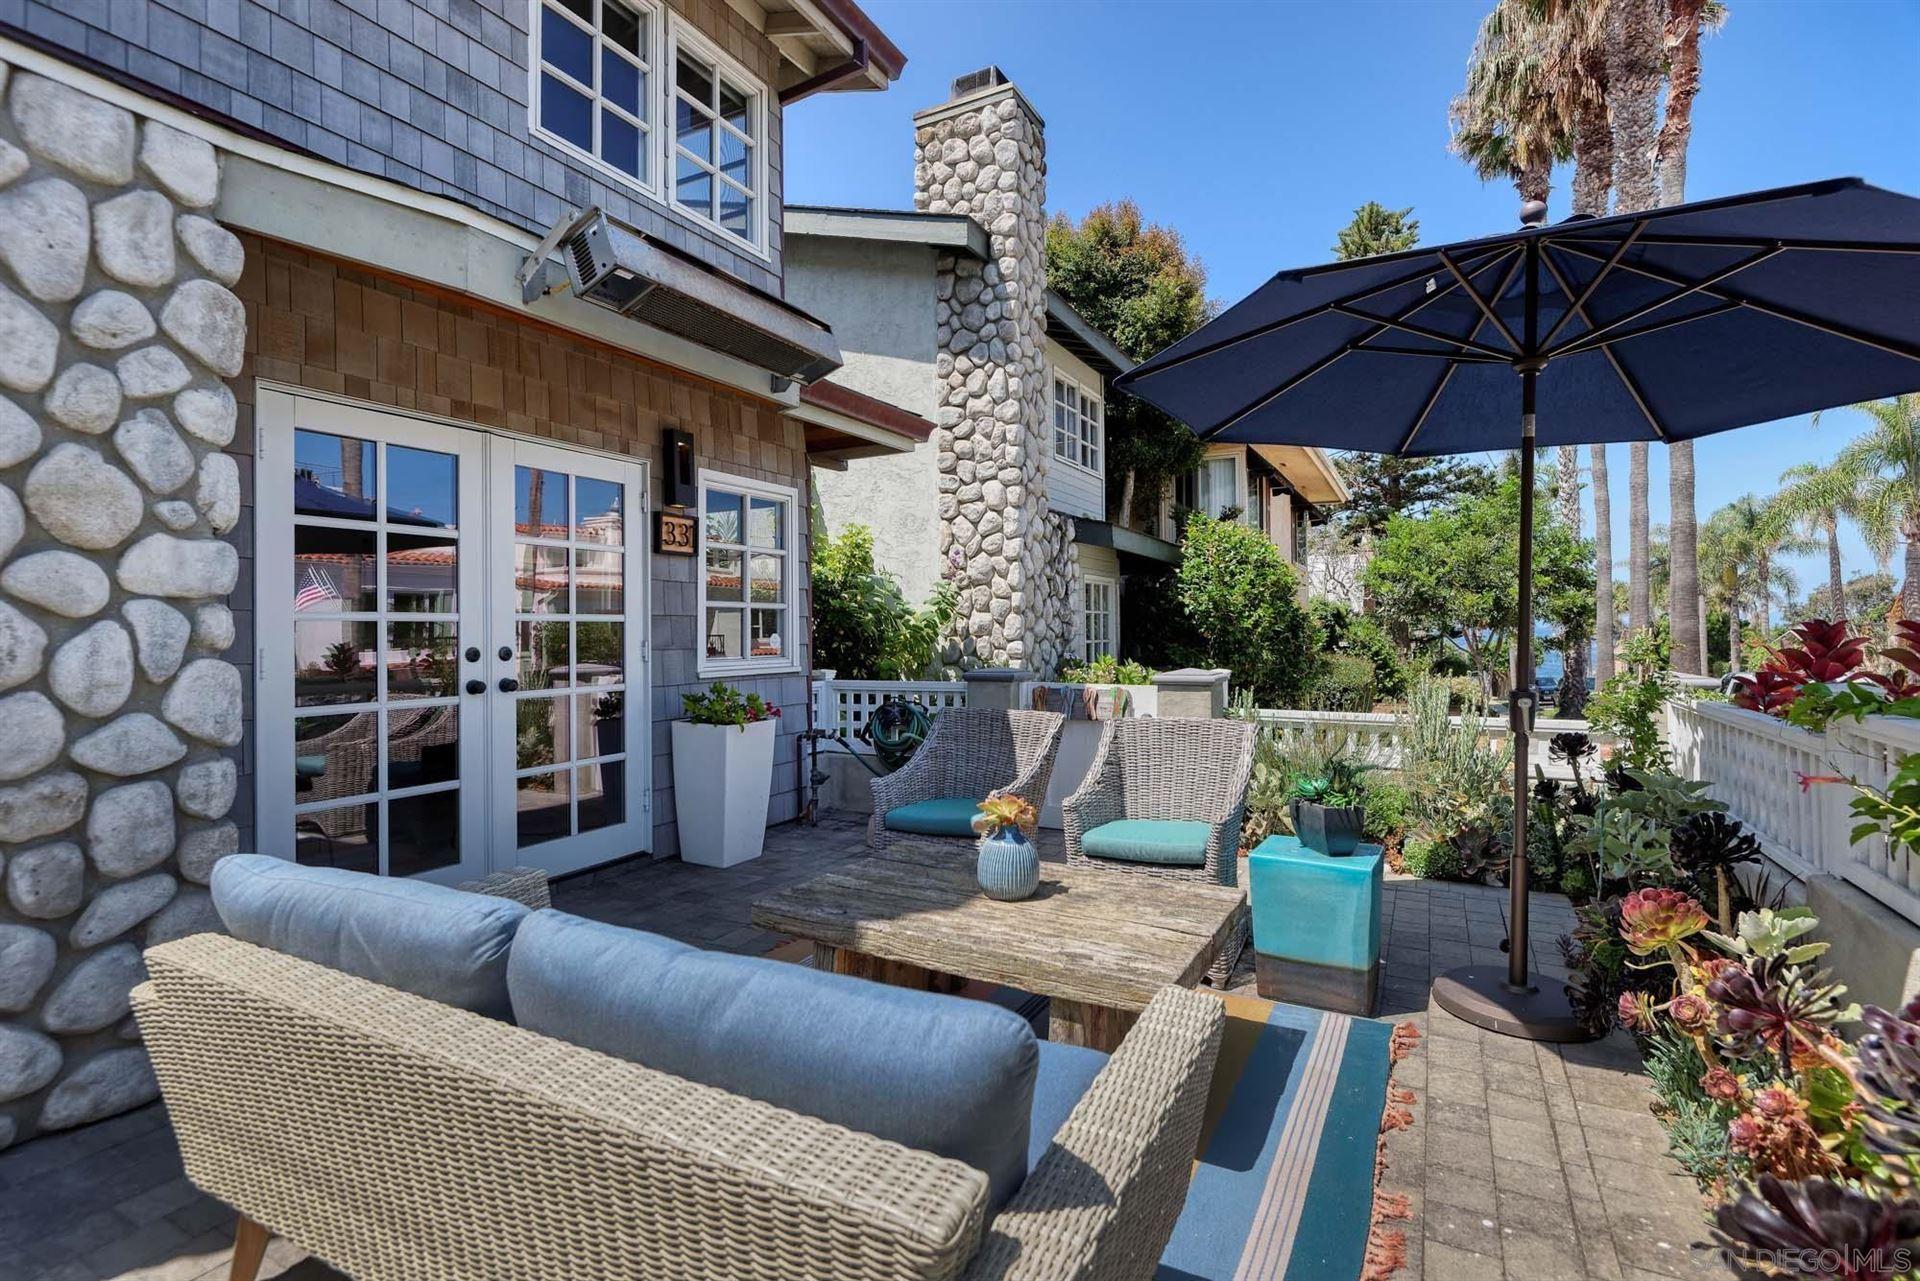 Photo of 331 Gravilla St, La Jolla, CA 92037 (MLS # 210021156)